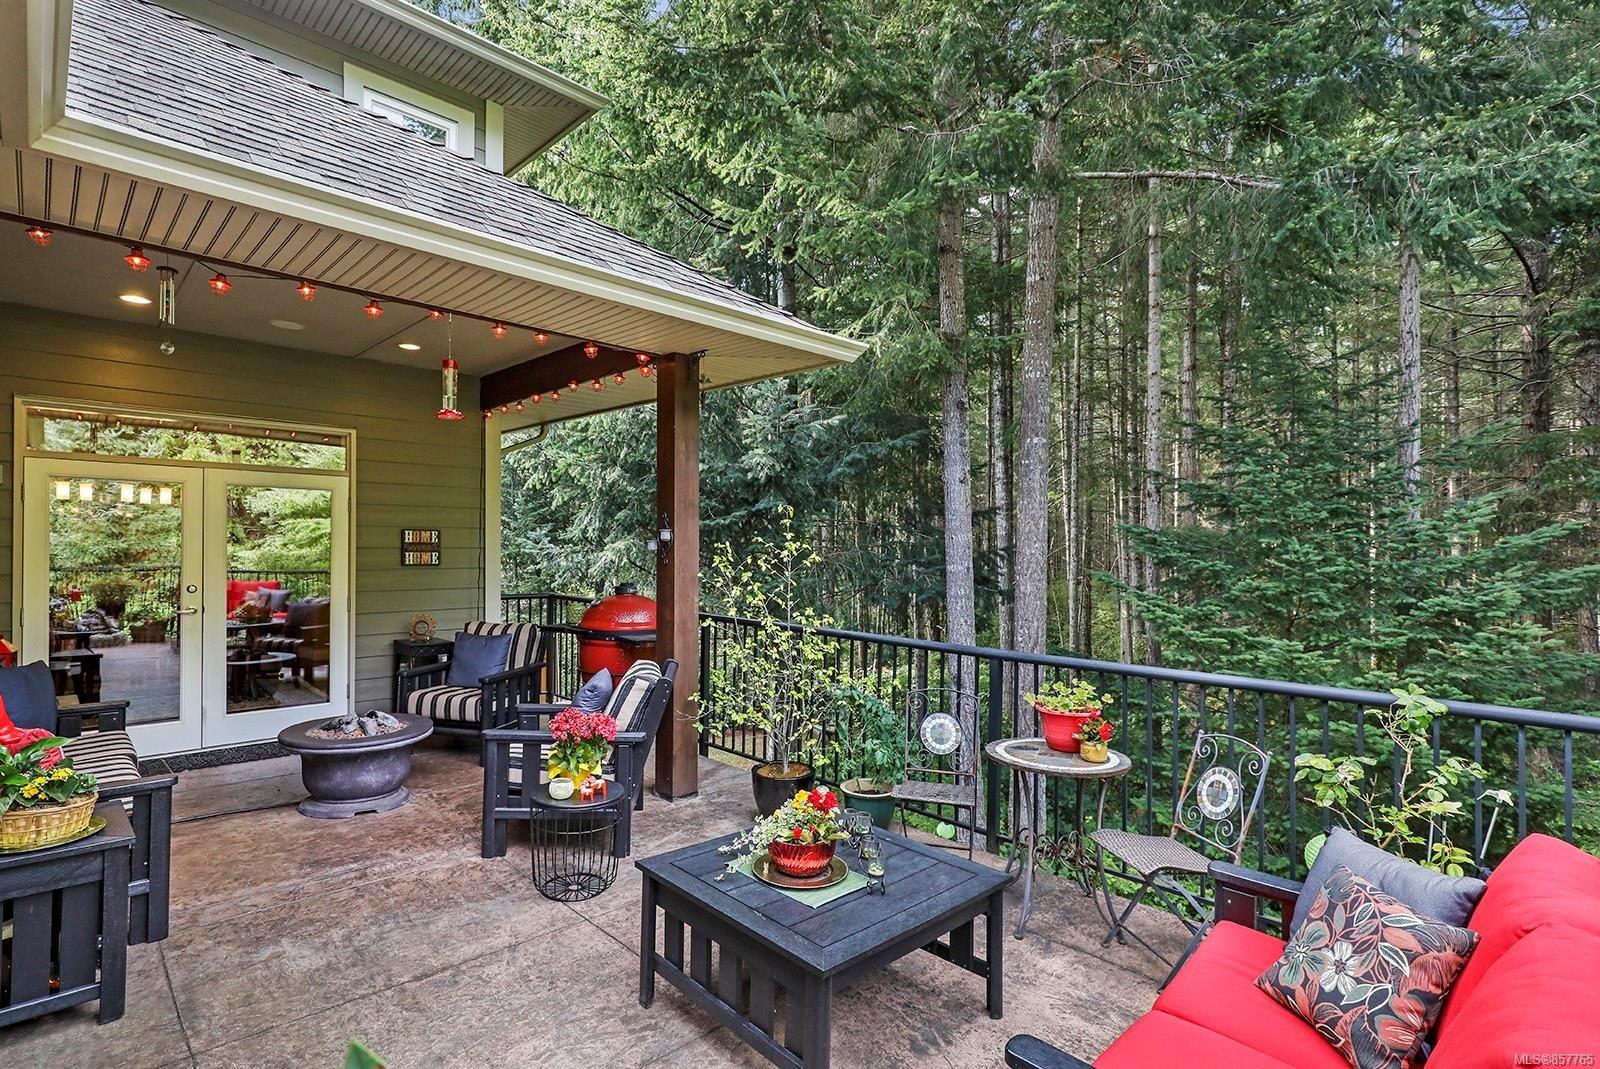 Photo 46: Photos: 1516 Highridge Dr in : CV Comox (Town of) House for sale (Comox Valley)  : MLS®# 857765